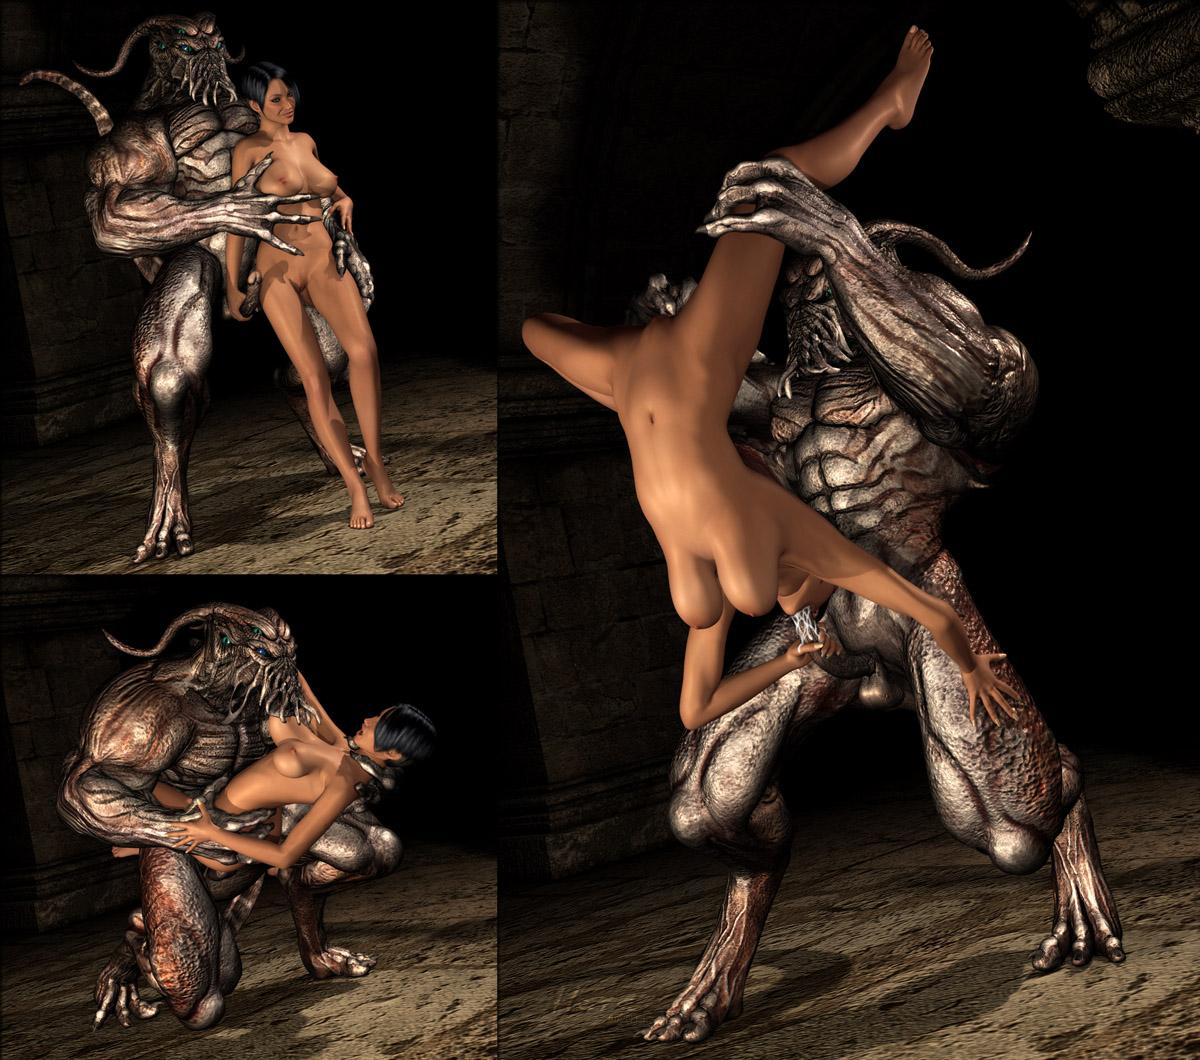 Hot tomb raider 3d sex videos pron photos